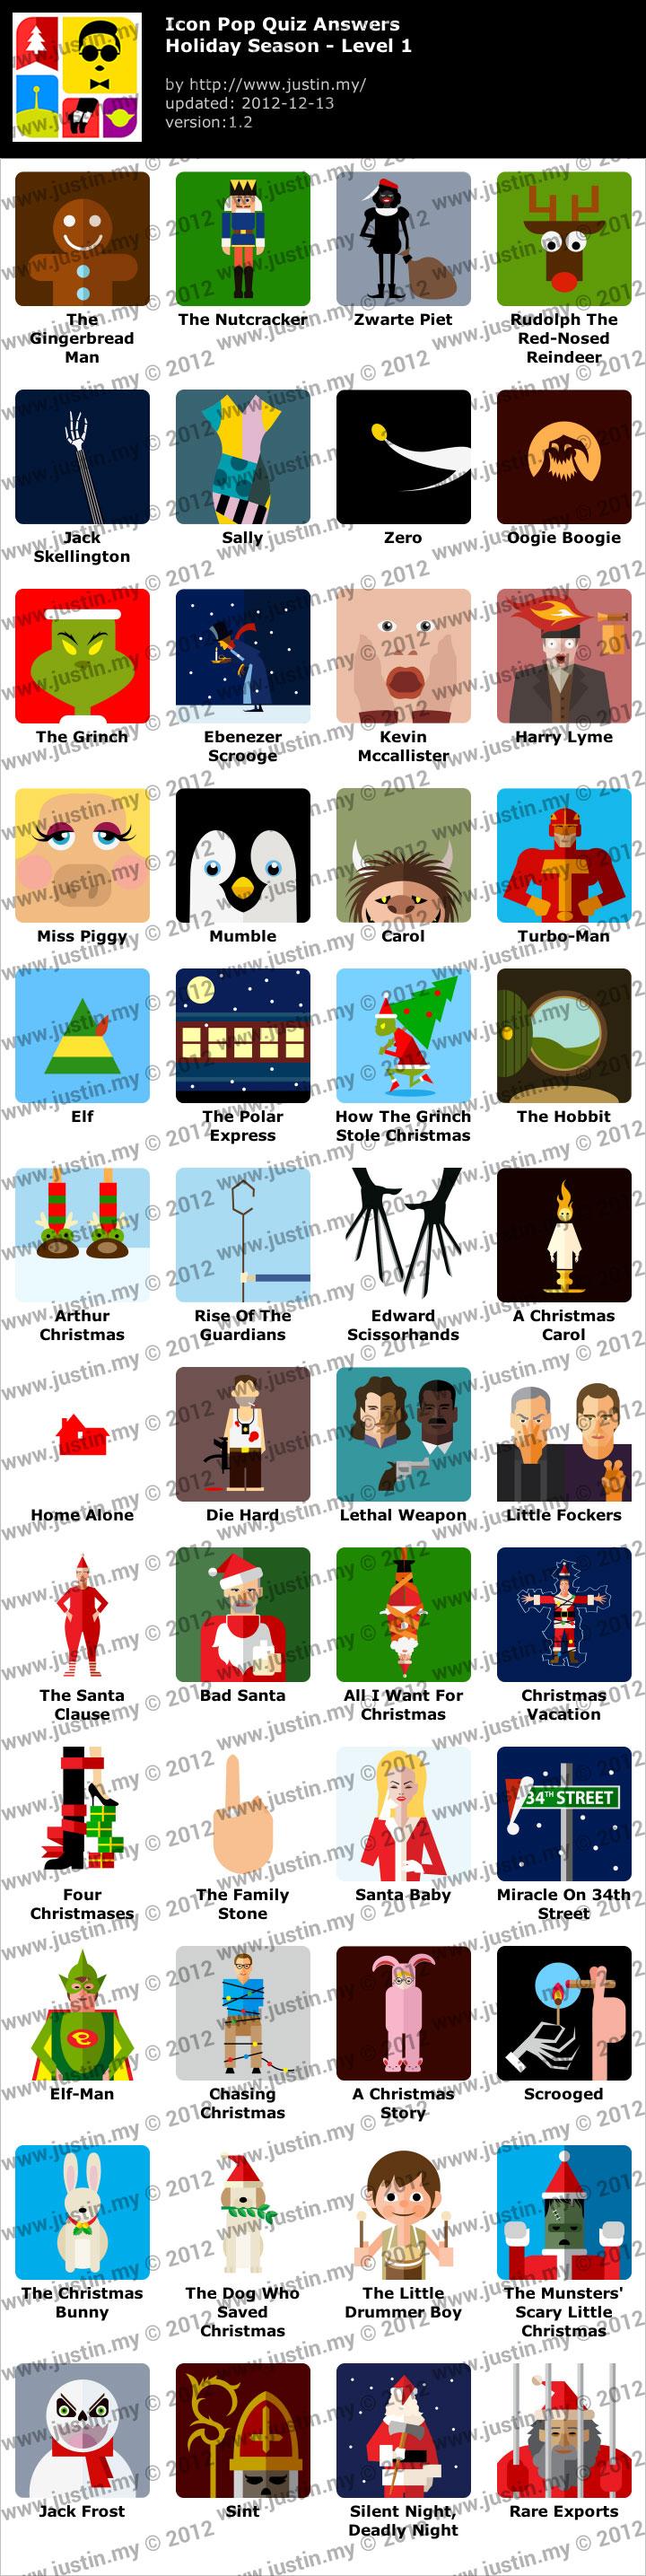 Icon Pop Quiz Holiday Season Level 01